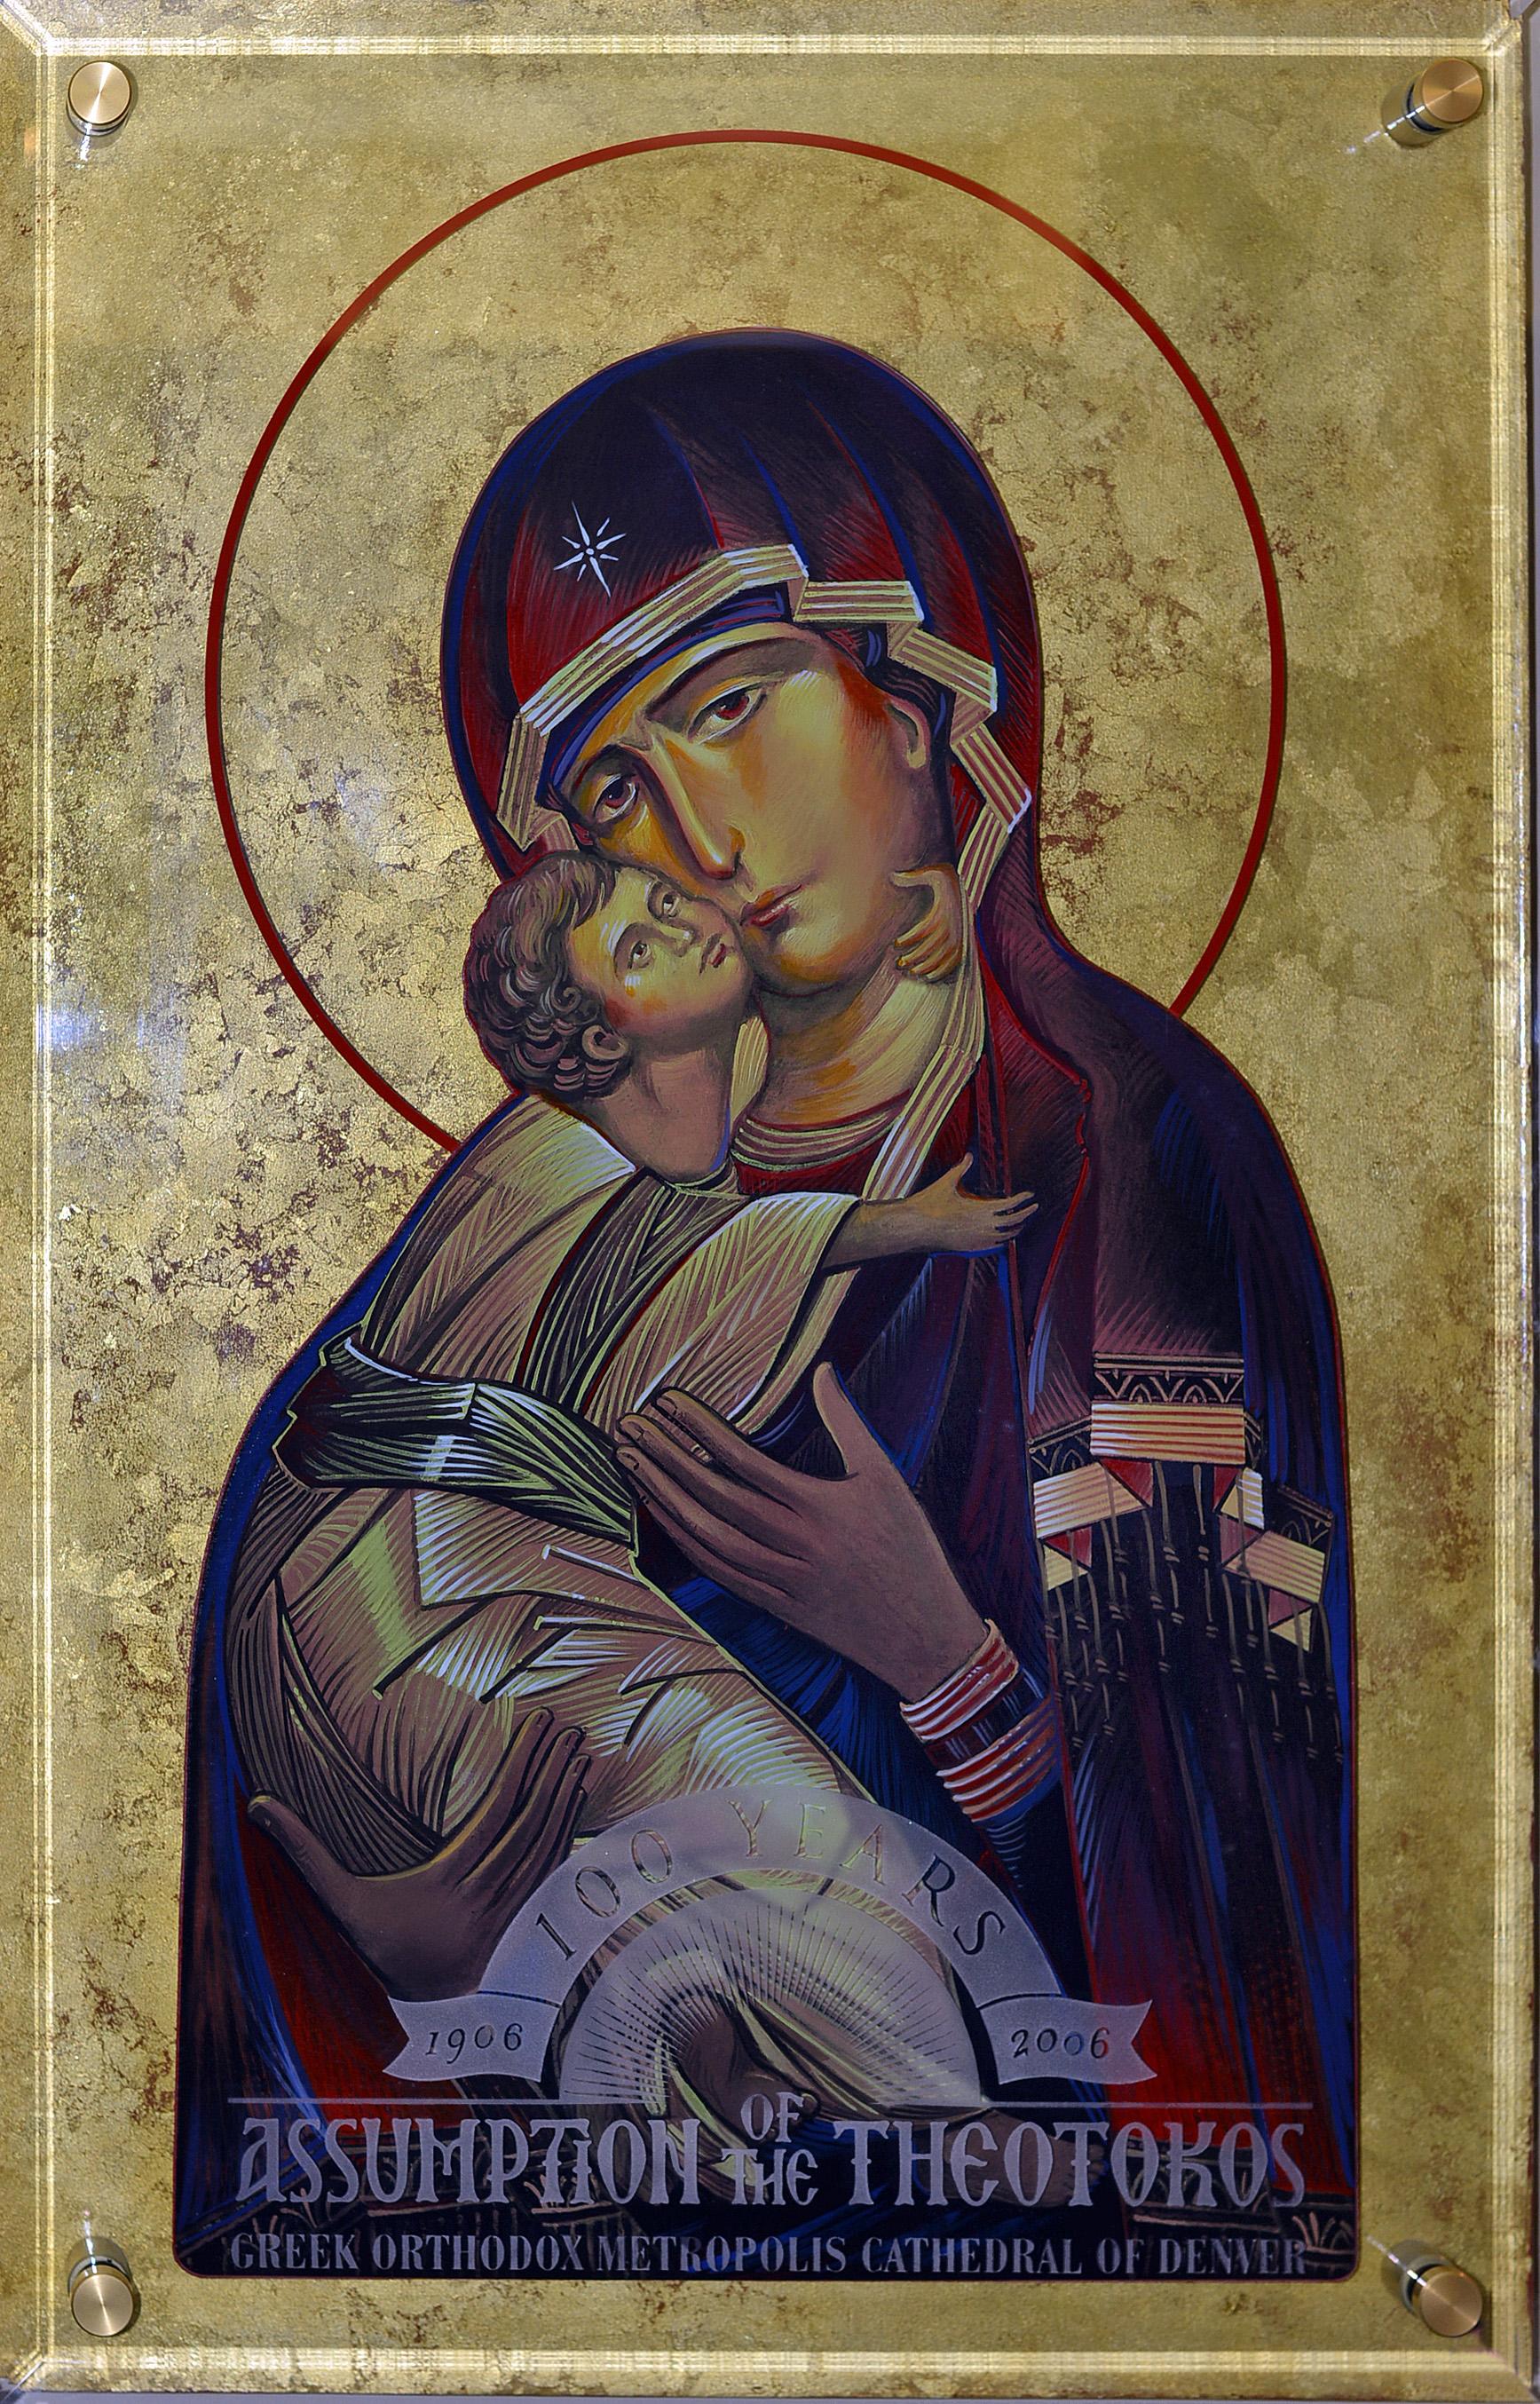 Entry-Theotokos Assumption Anniversary.jpg